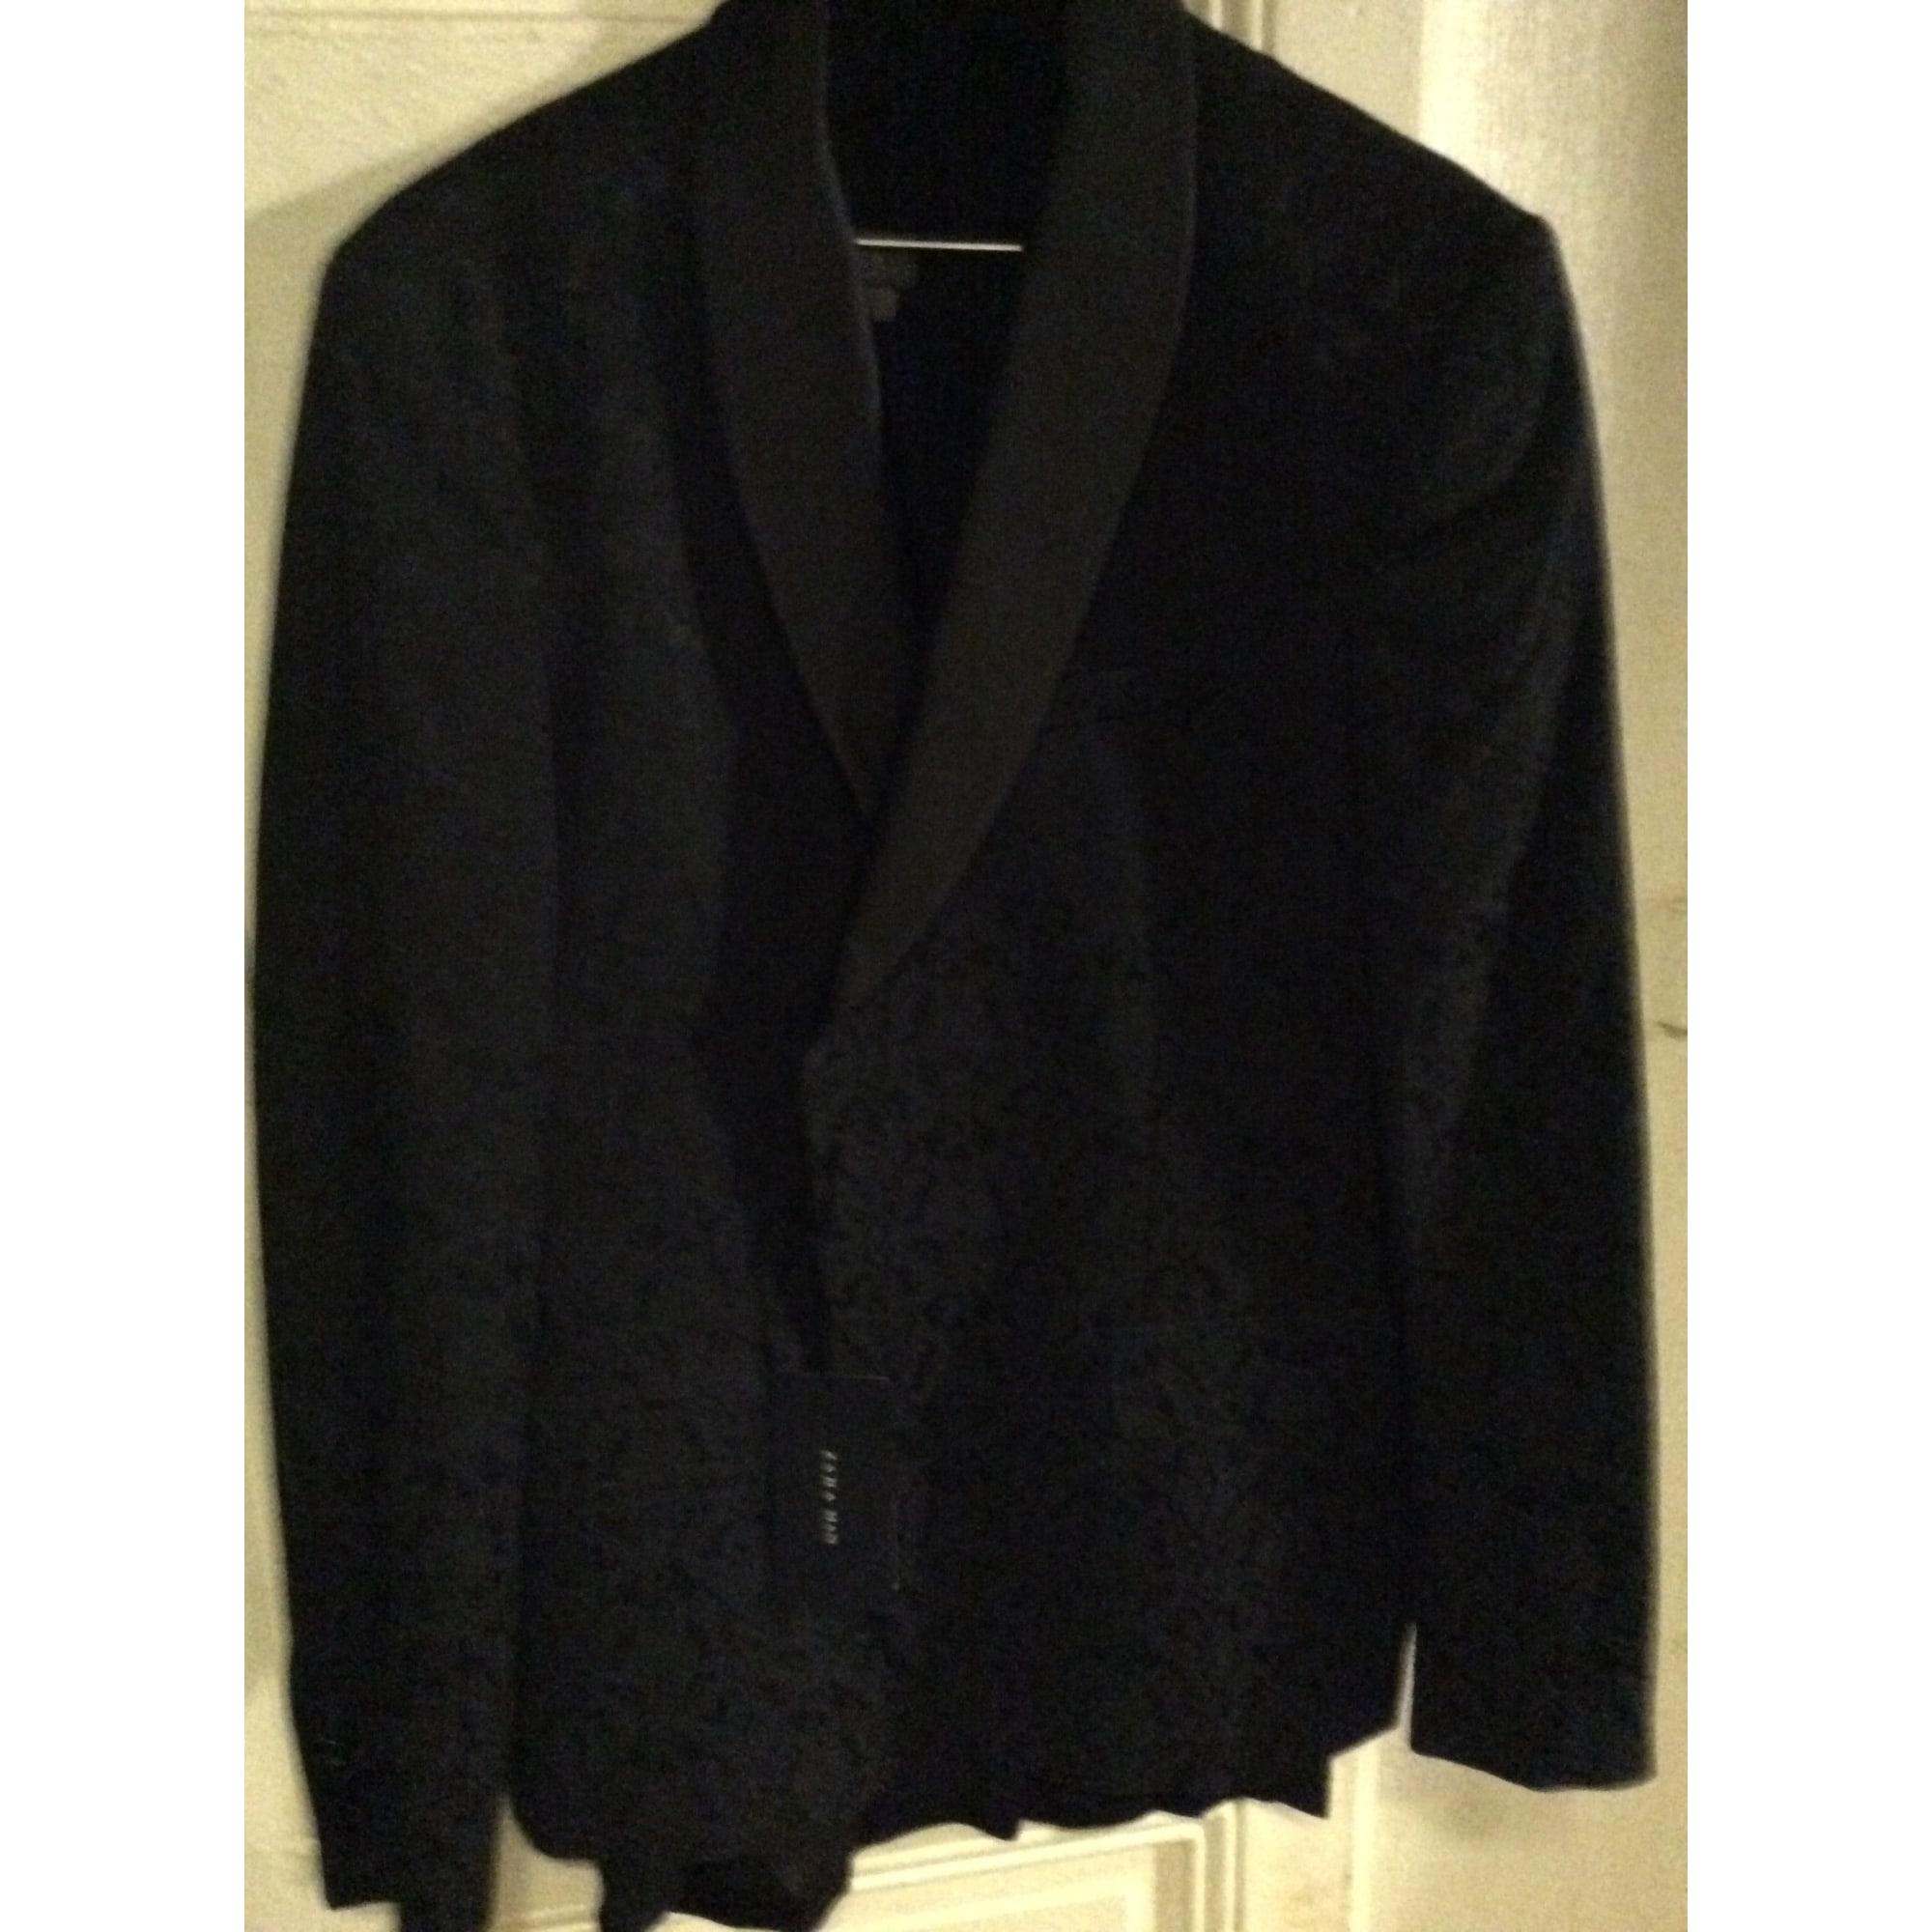 Jacket ZARA Black